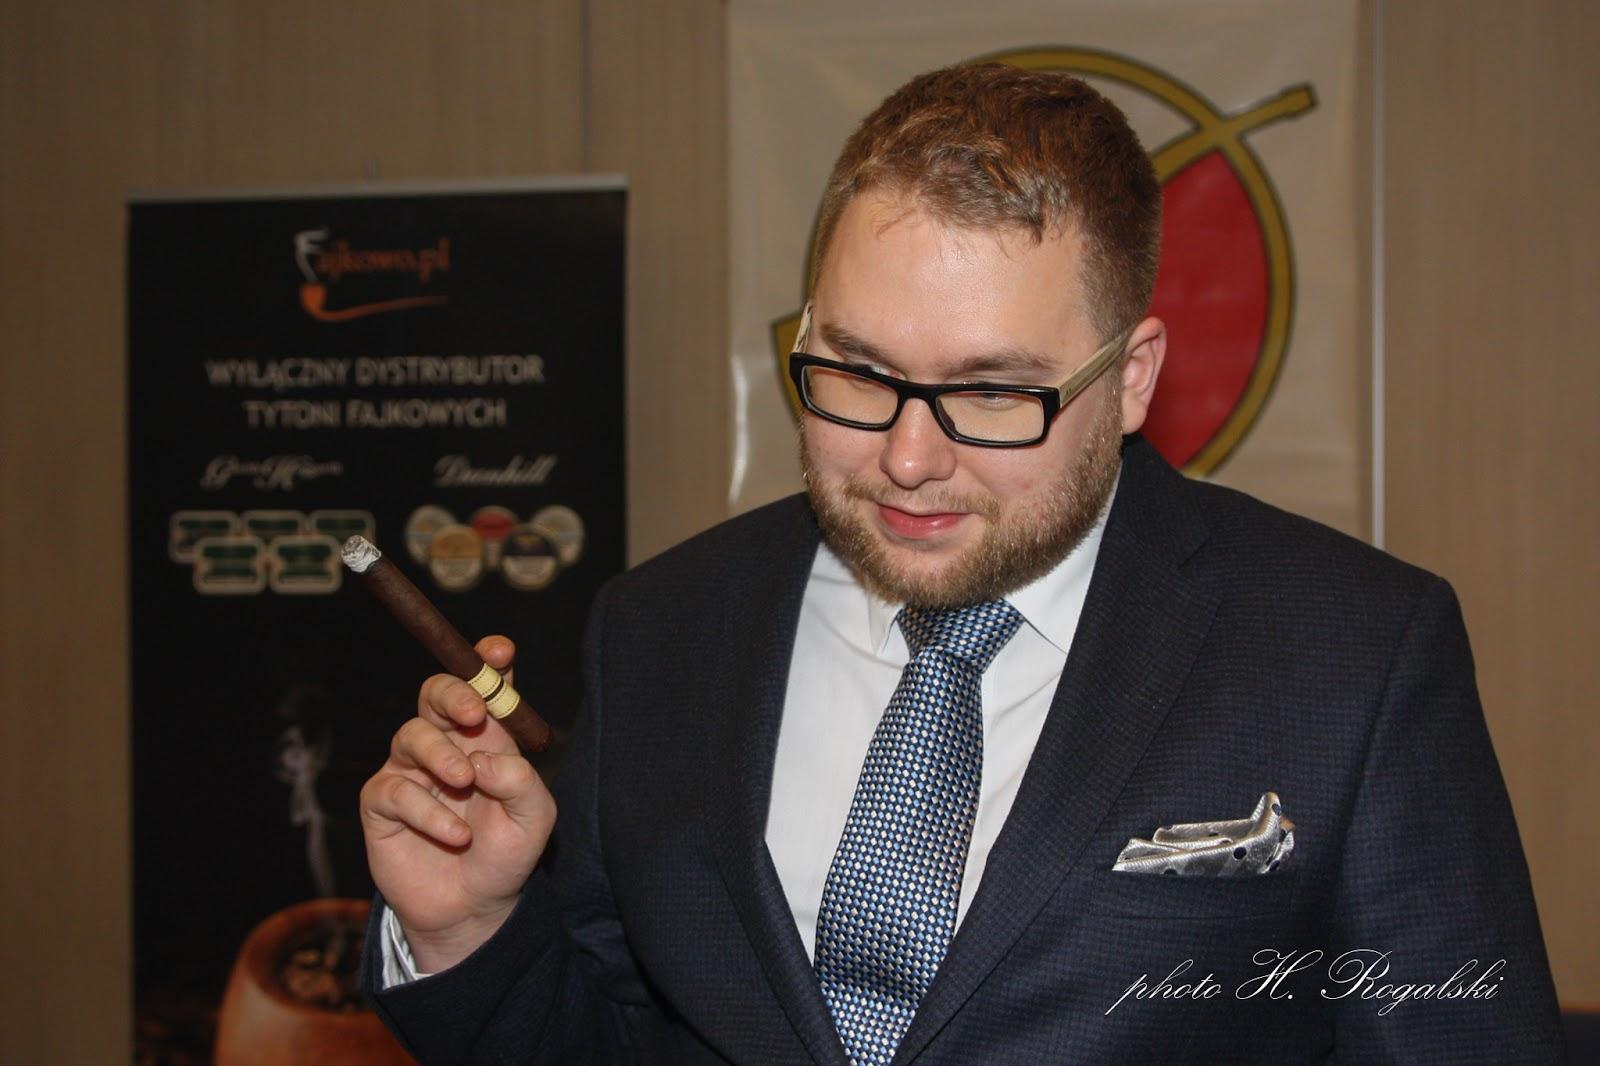 2015-01-31_Turniej Palenia Cygar Robusto Stanislav